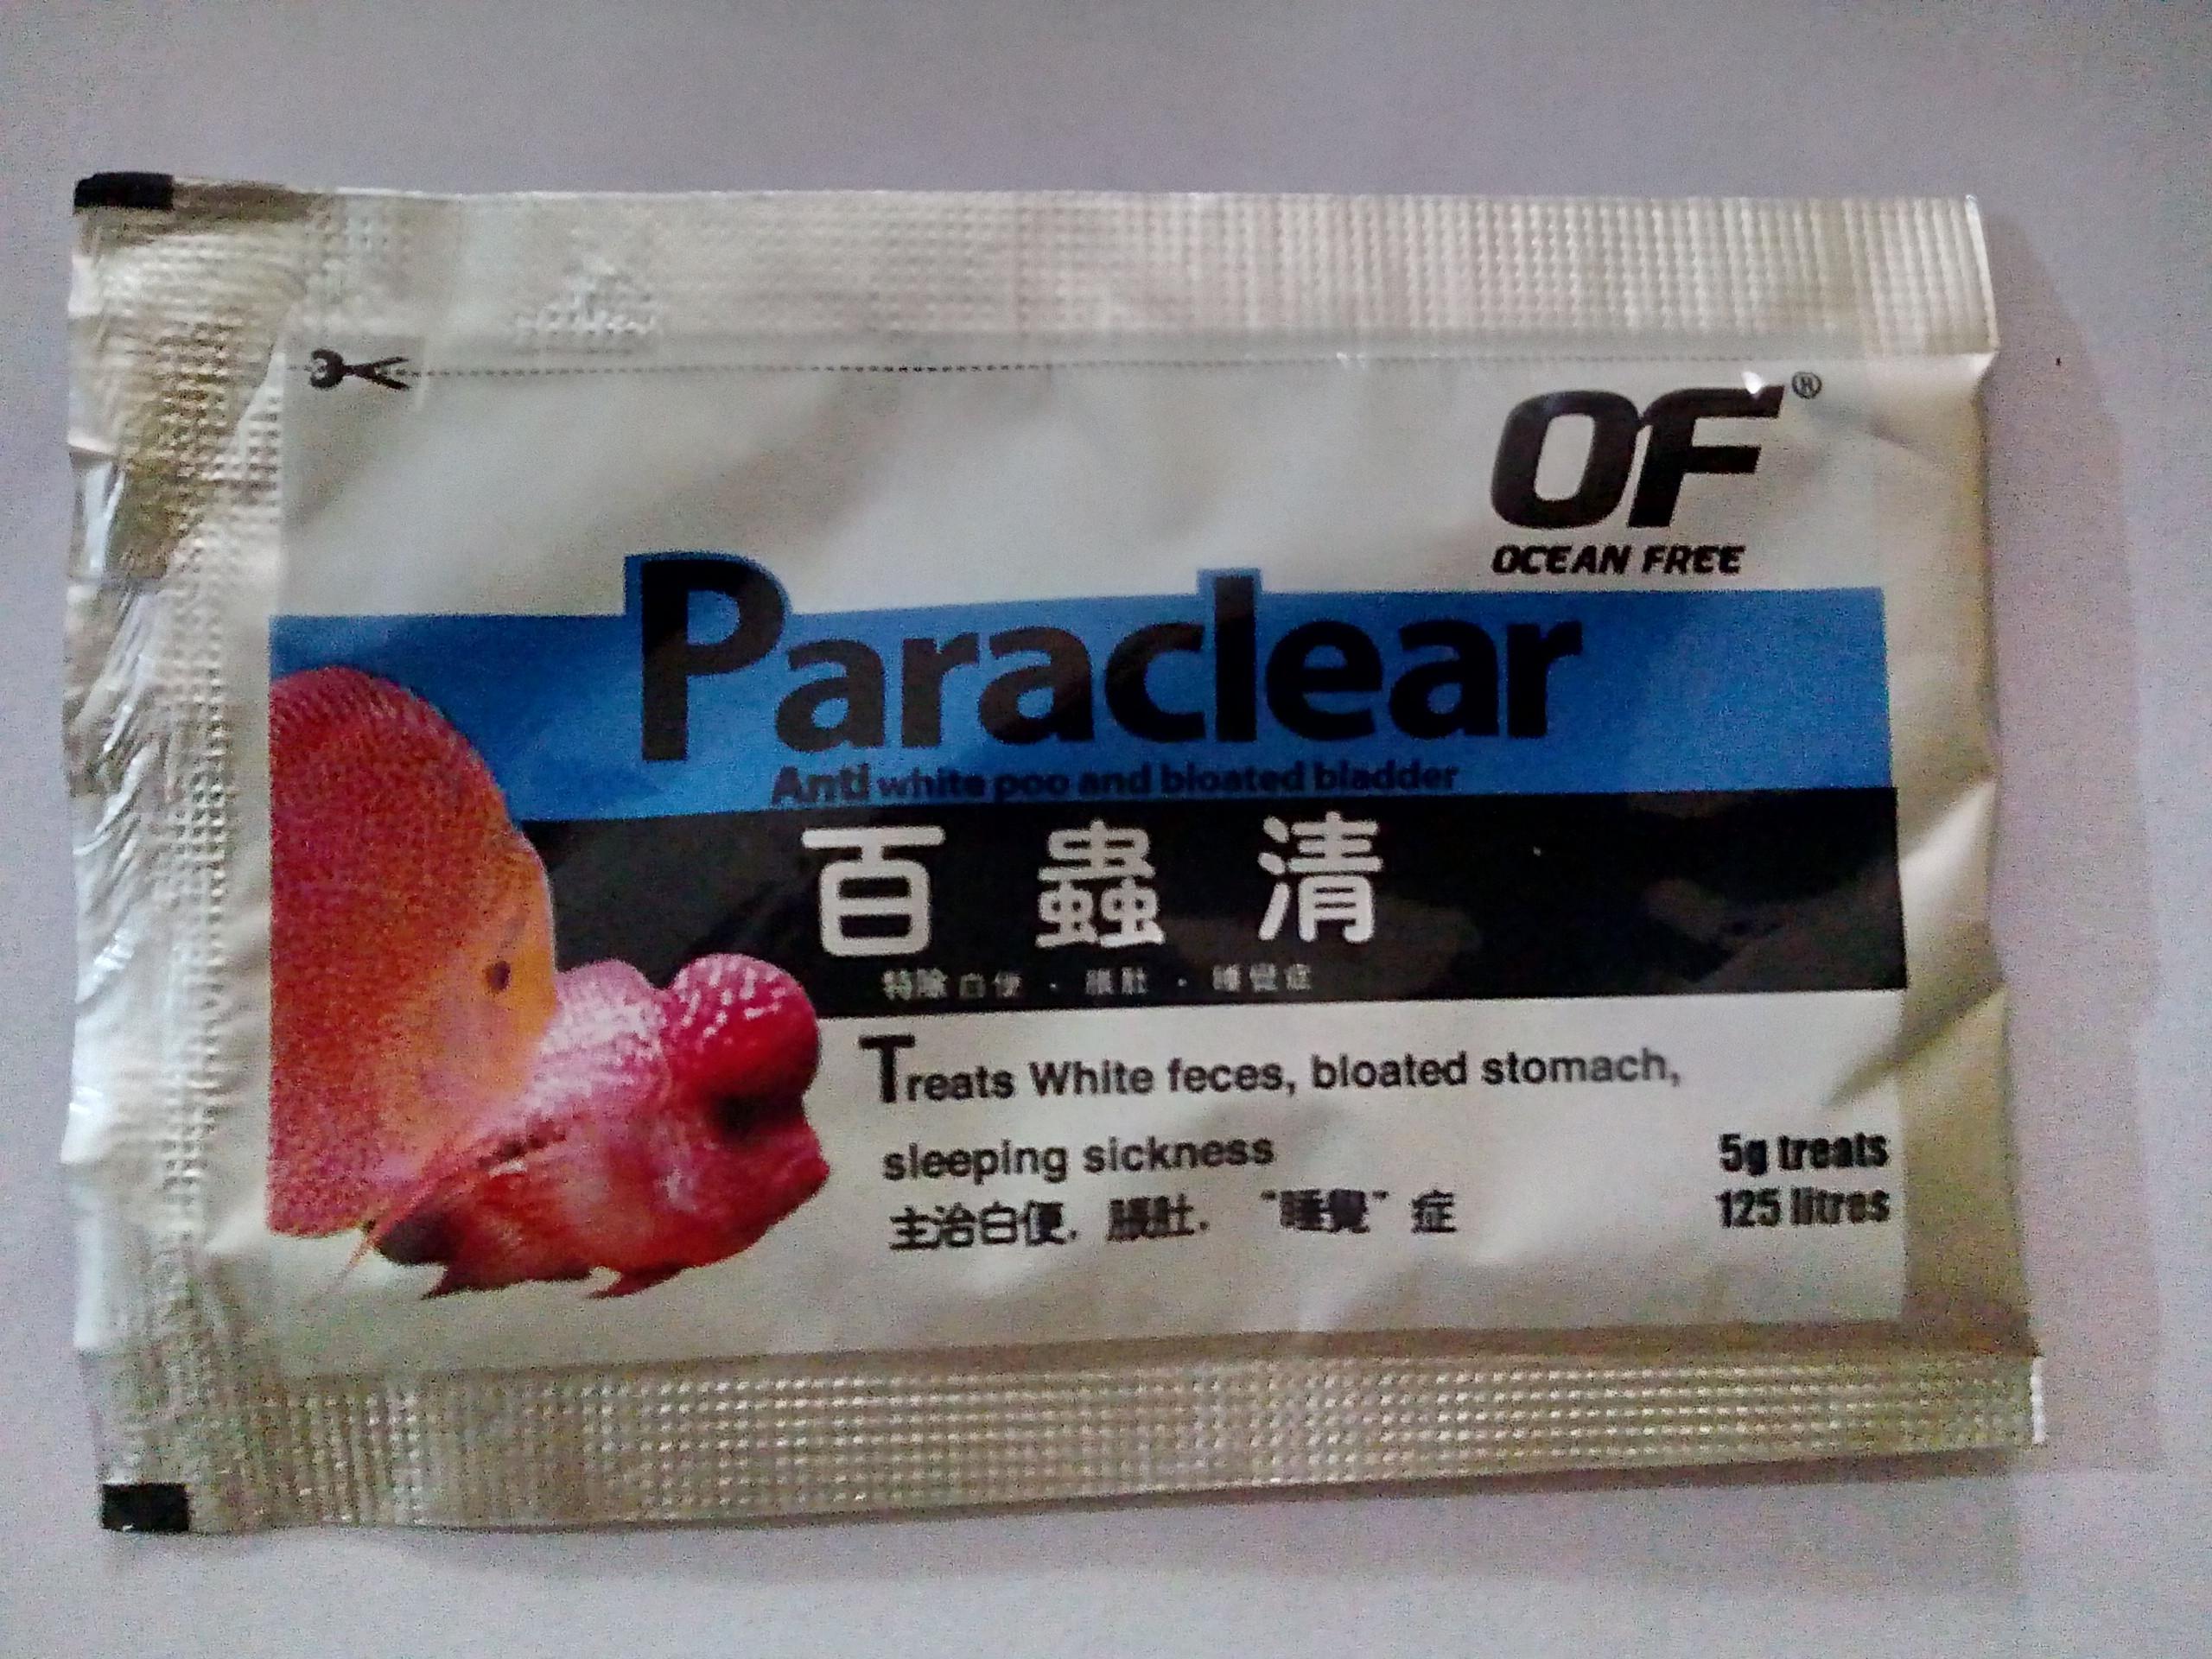 ocean free Paraclear